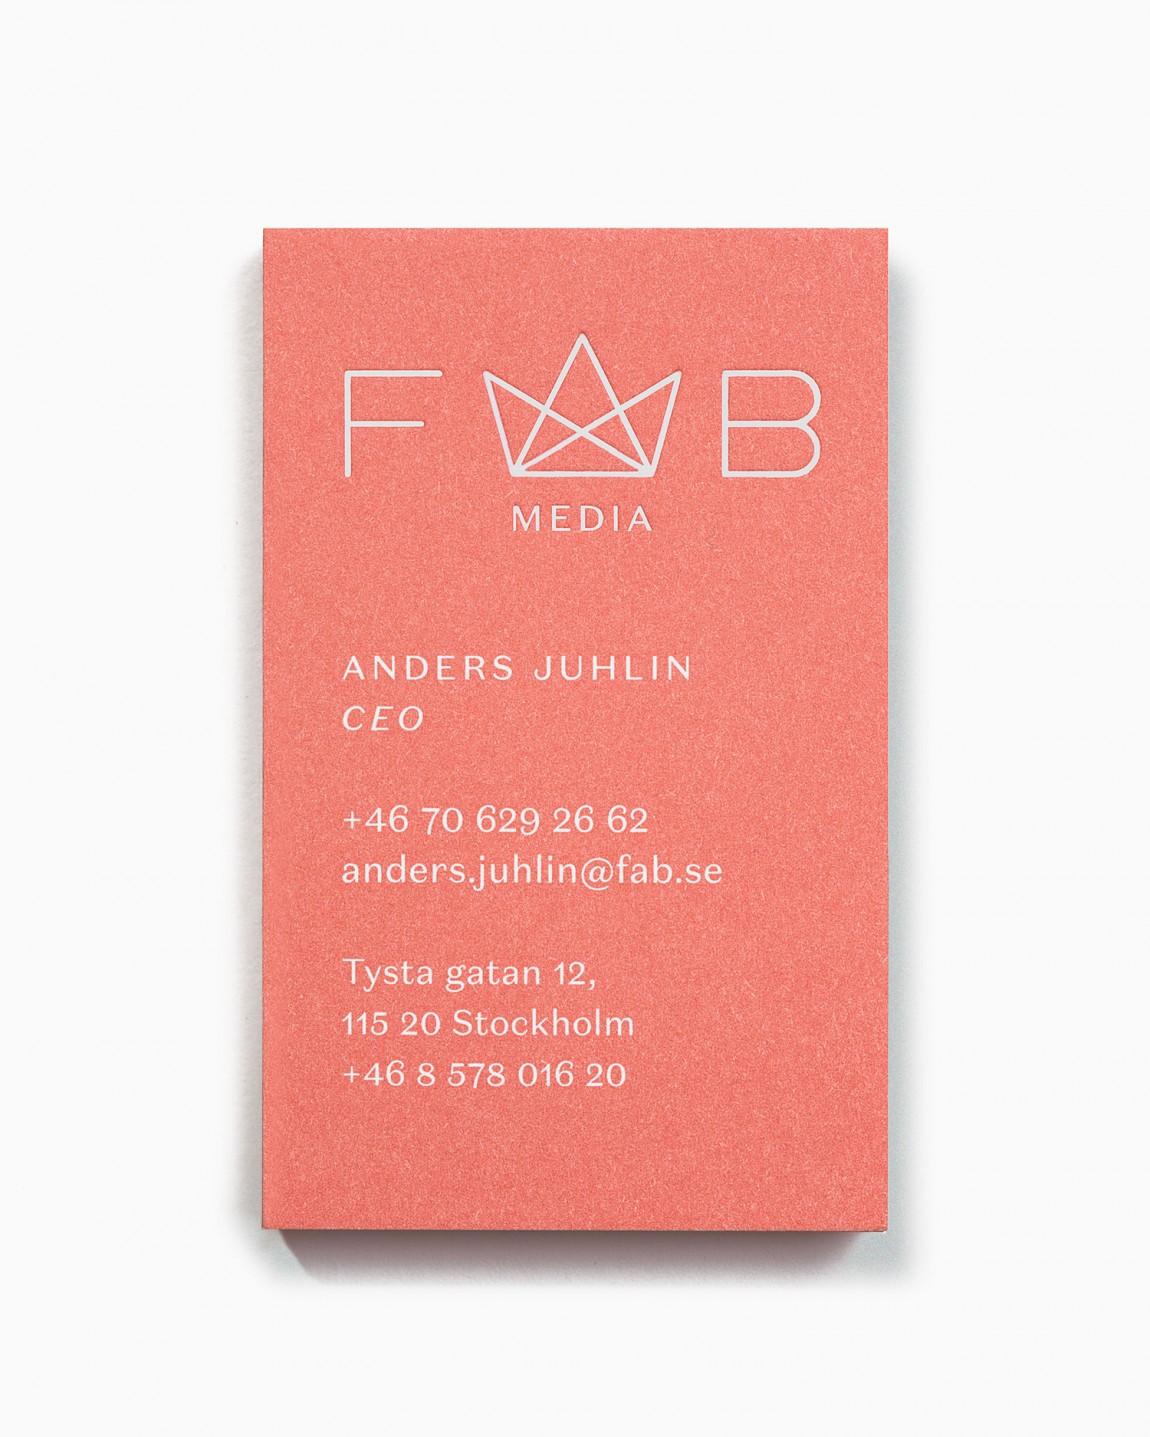 Fab Media瑞典媒体公司品牌升级改造,名片设计